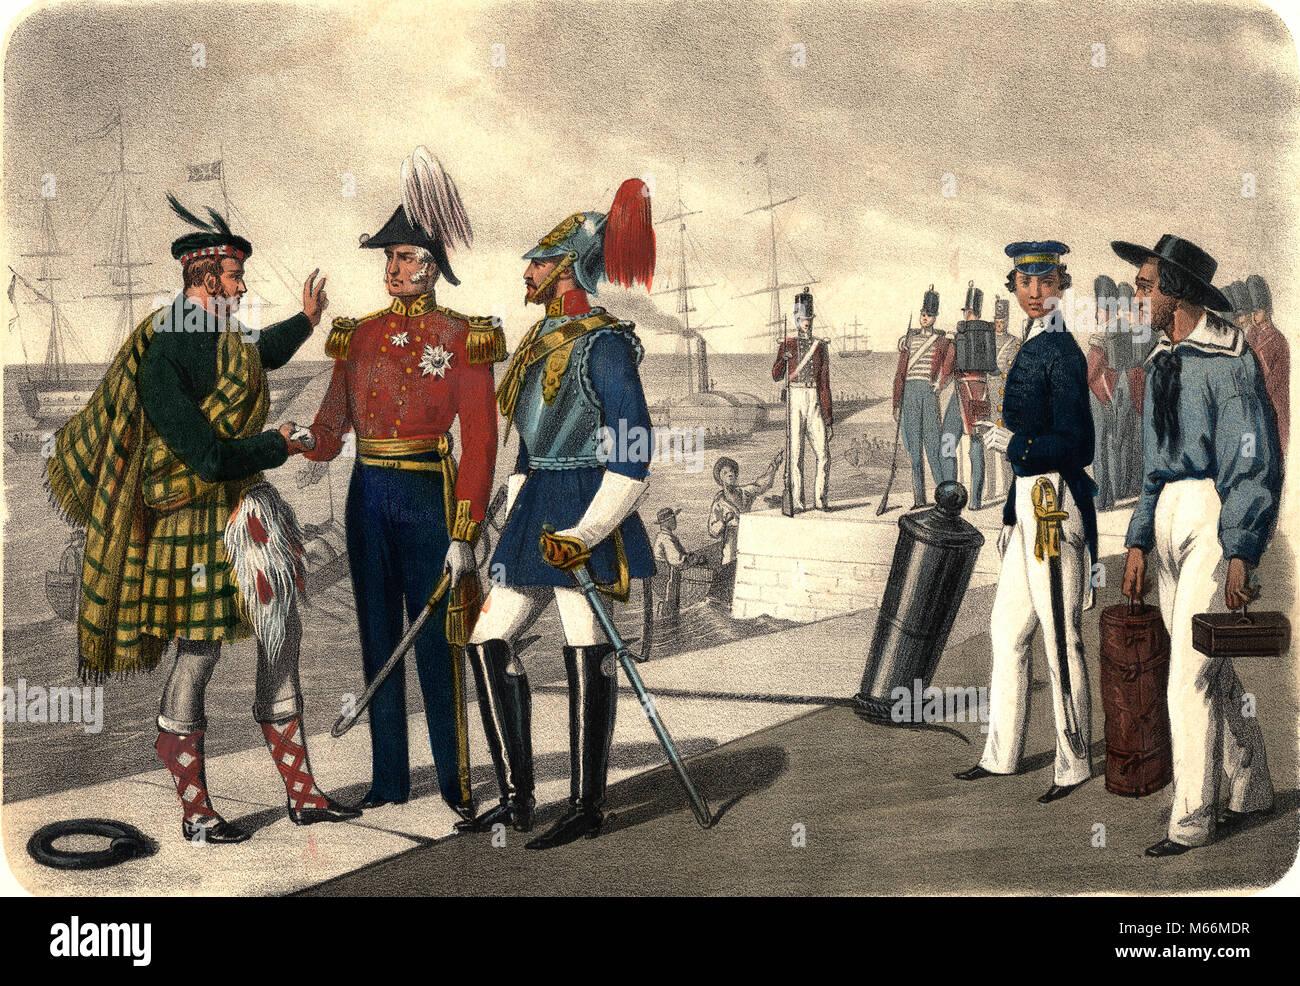 1800s 19TH CENTURY VICTORIAN MILITARY MEN IN UNIFORM SCOTSMAN KILT GENERAL OFFICER HORSEGUARD MARINE SAILOR - kh13282 Stock Photo